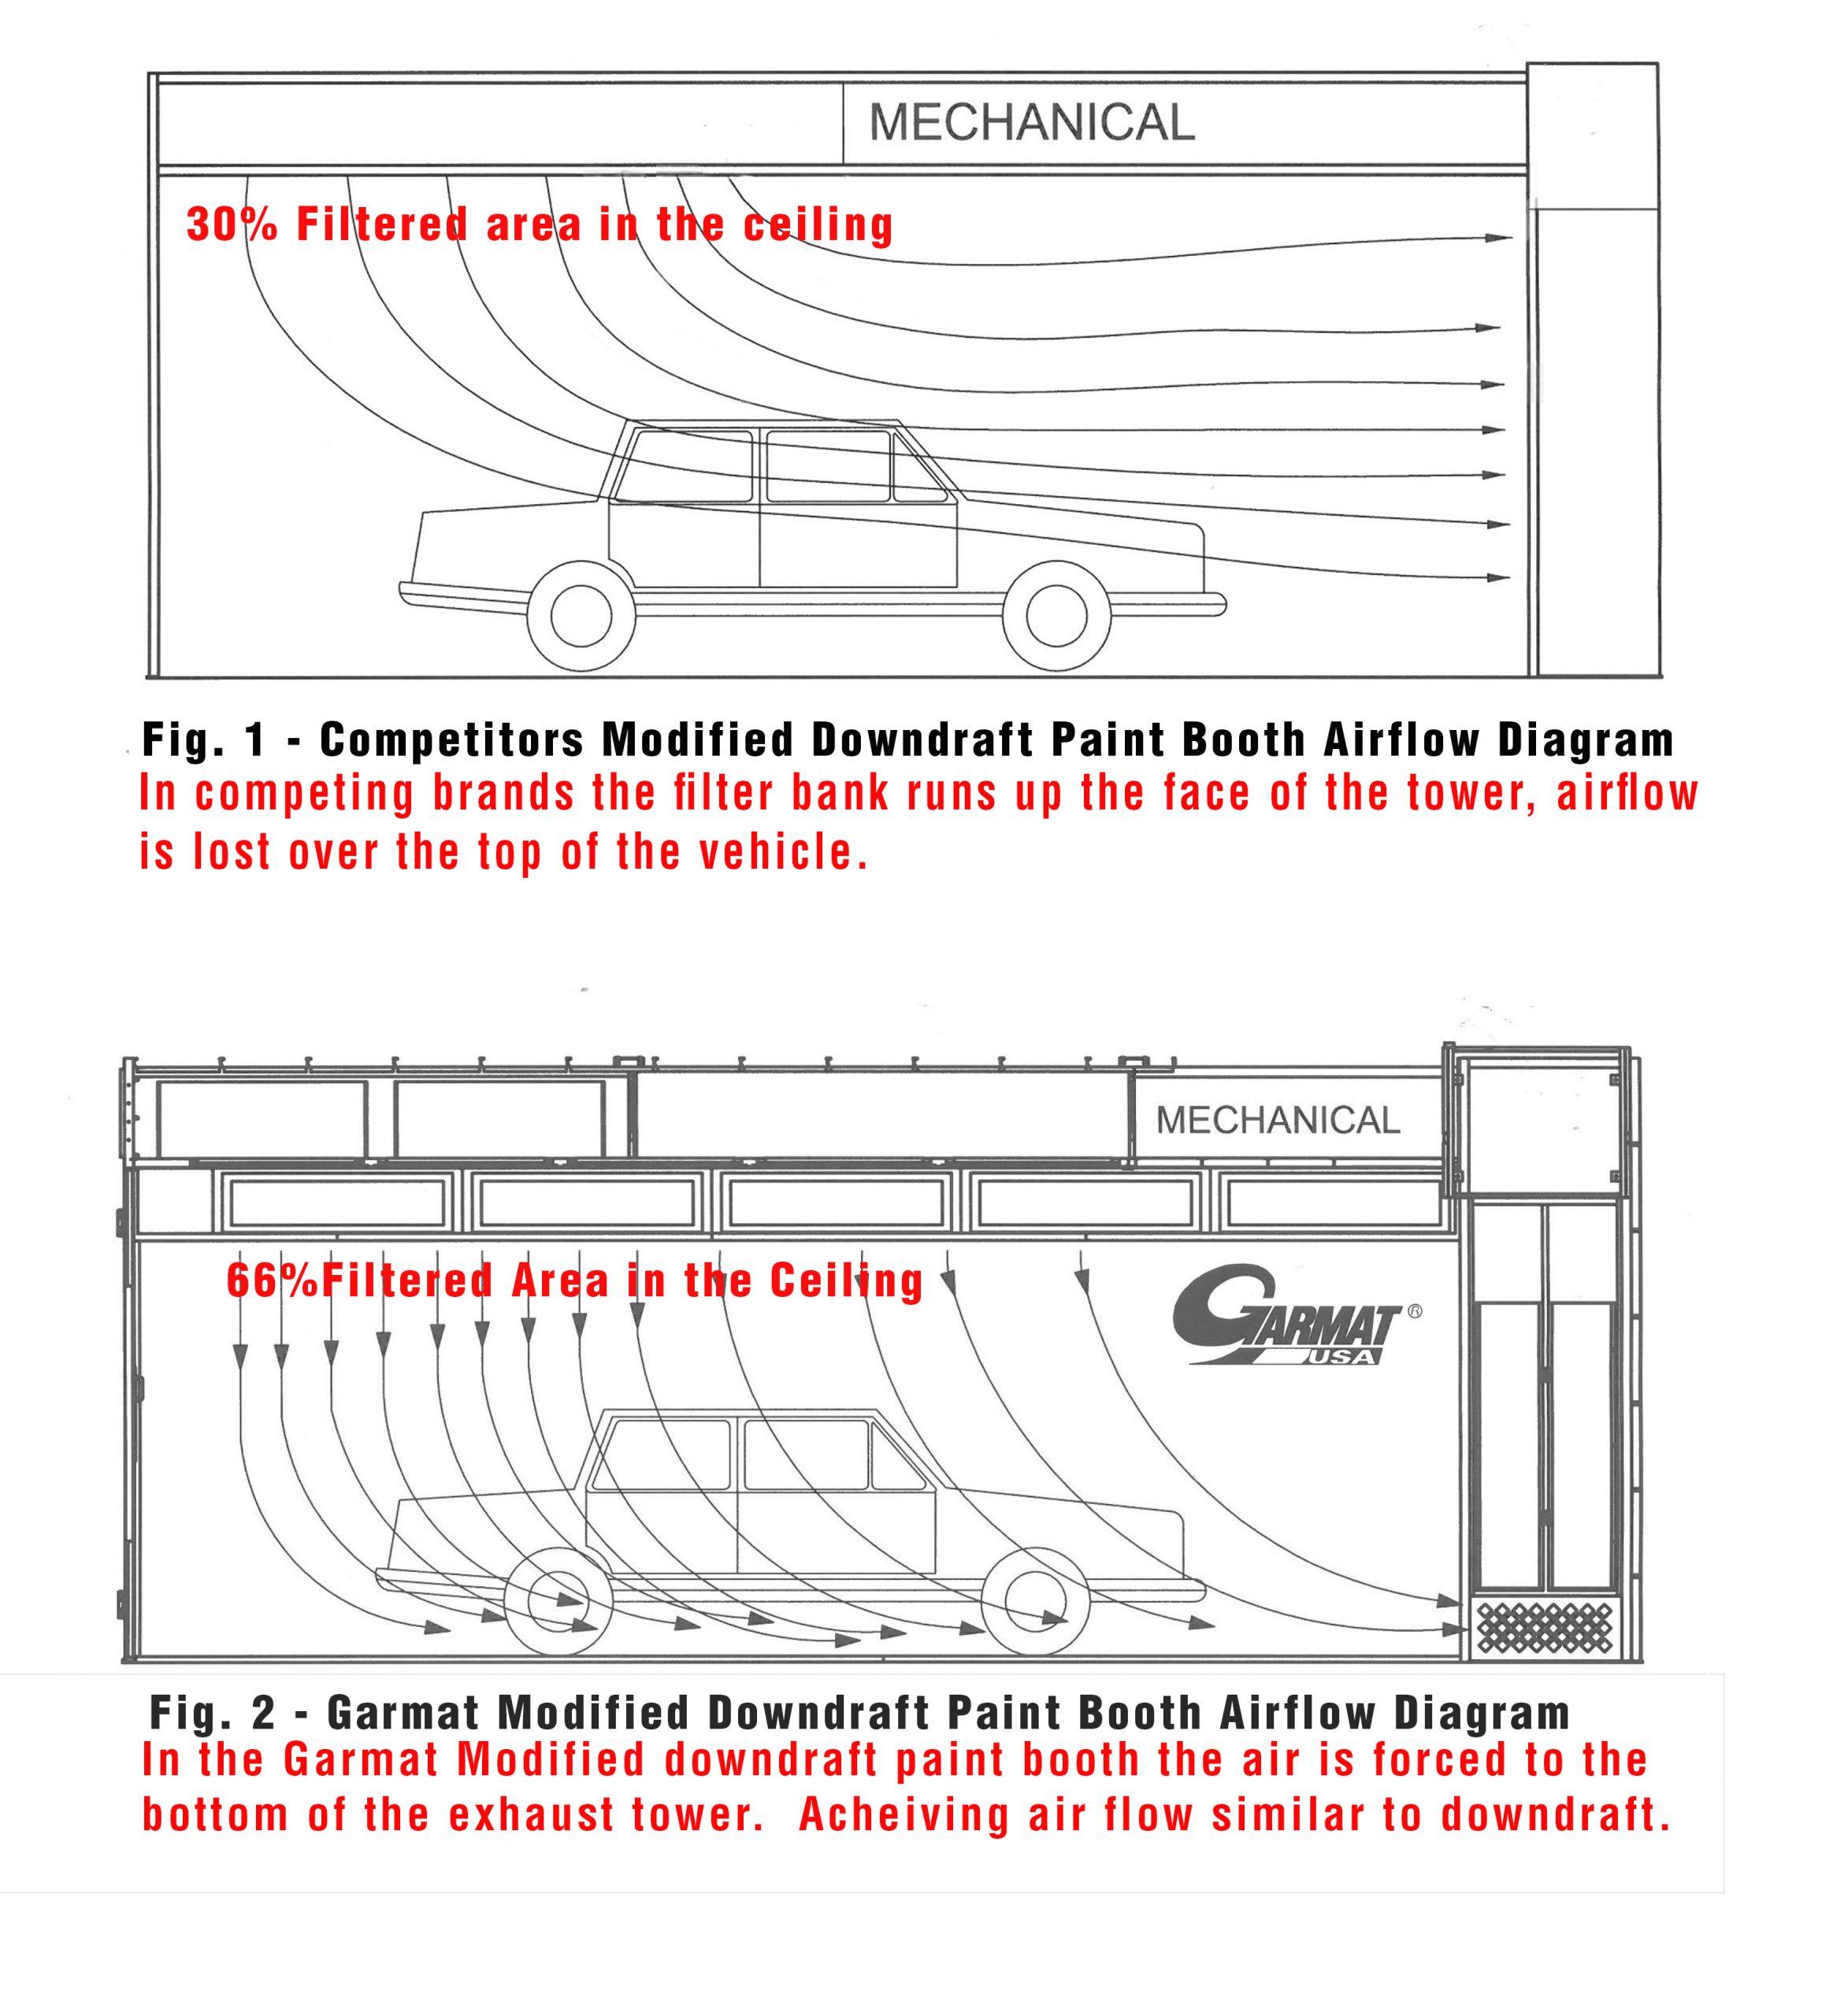 Garmat Air flow vs Comp Mod Down(2)-1